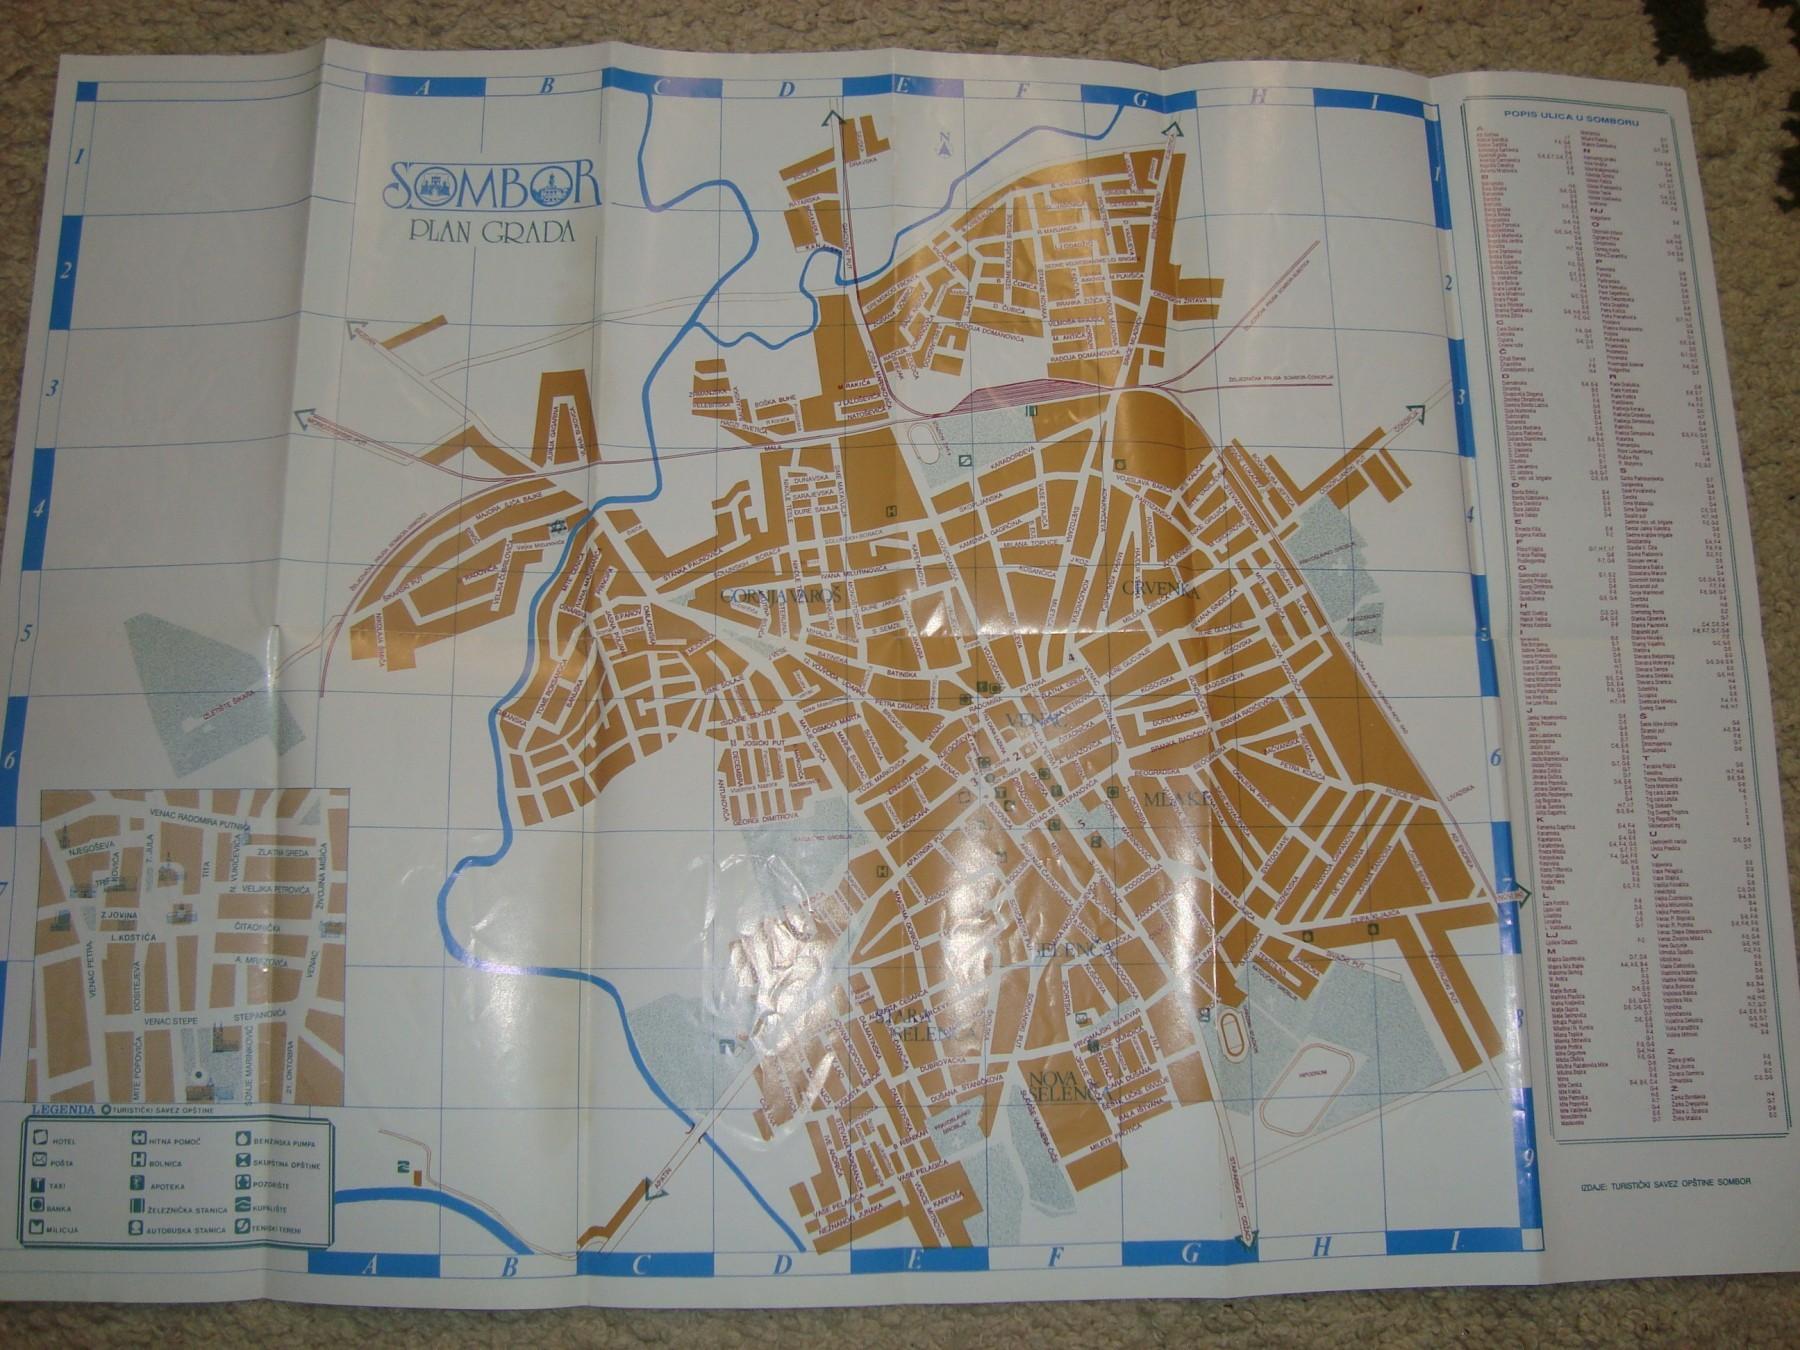 Plan Grad Sombora Karta Sombora Kupindo Com 45886269